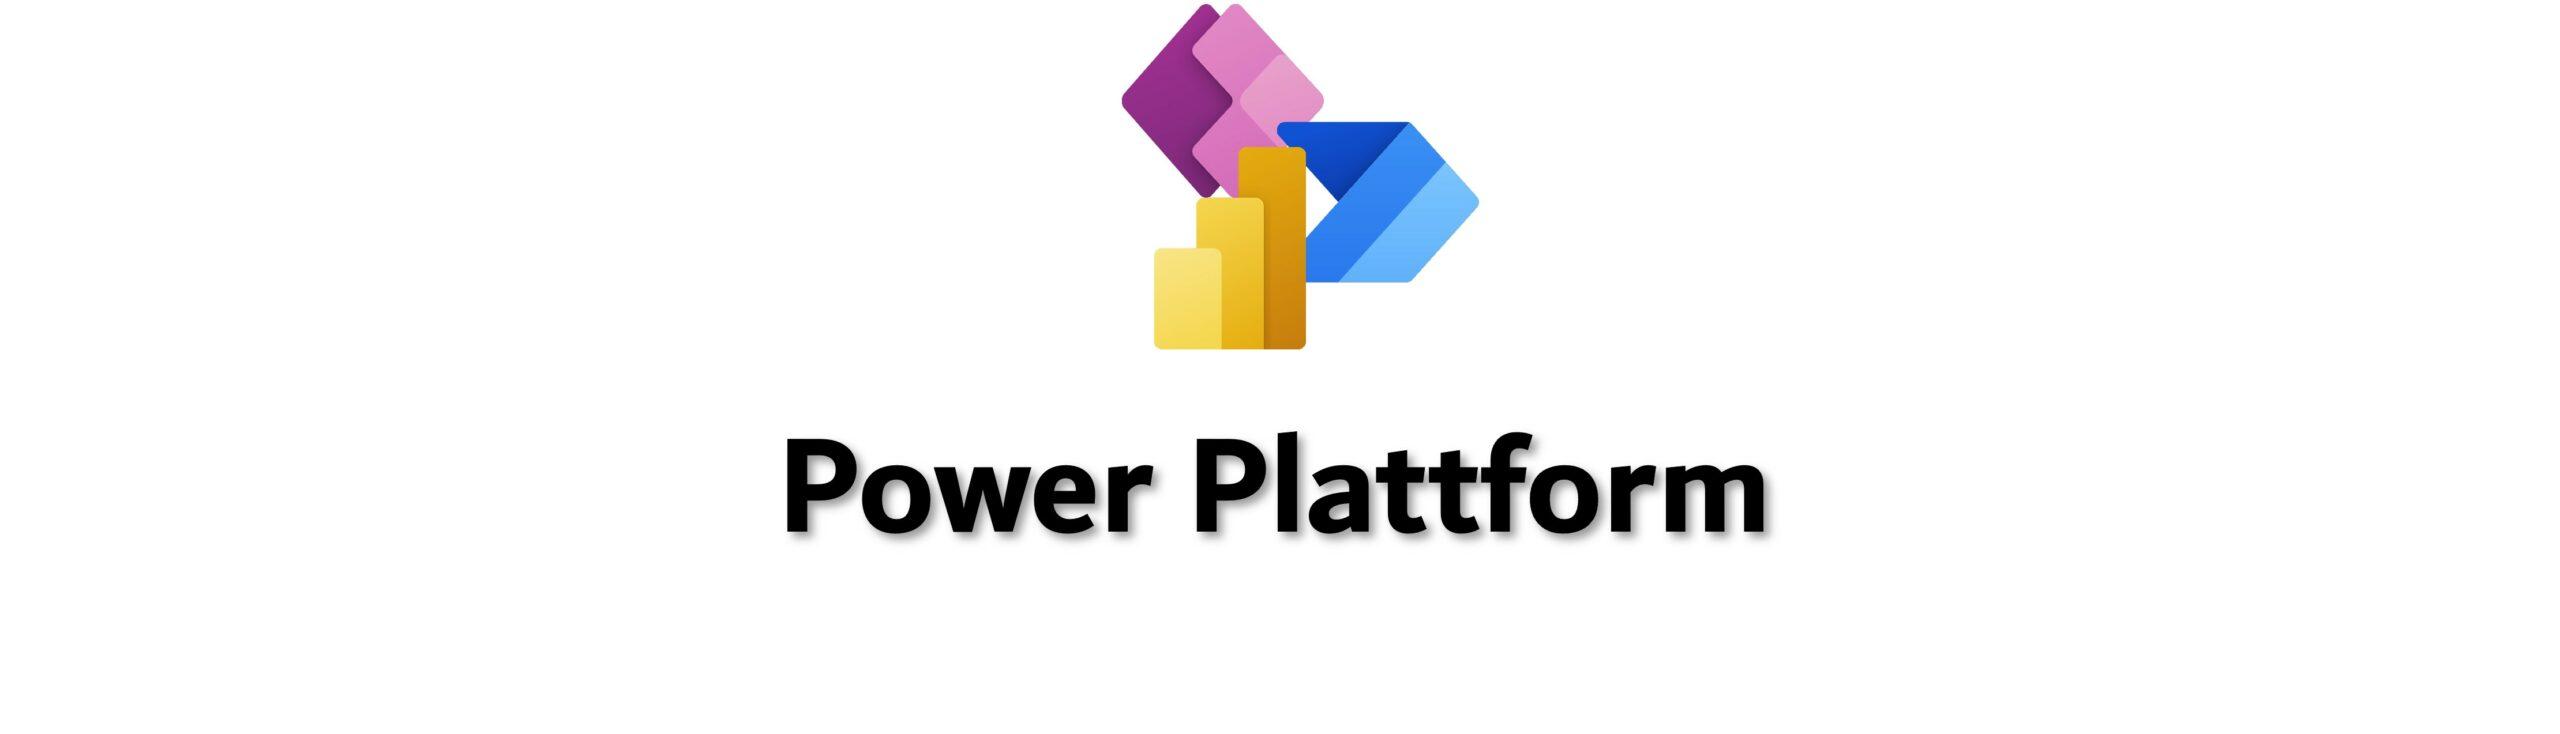 Power Plattform Logo